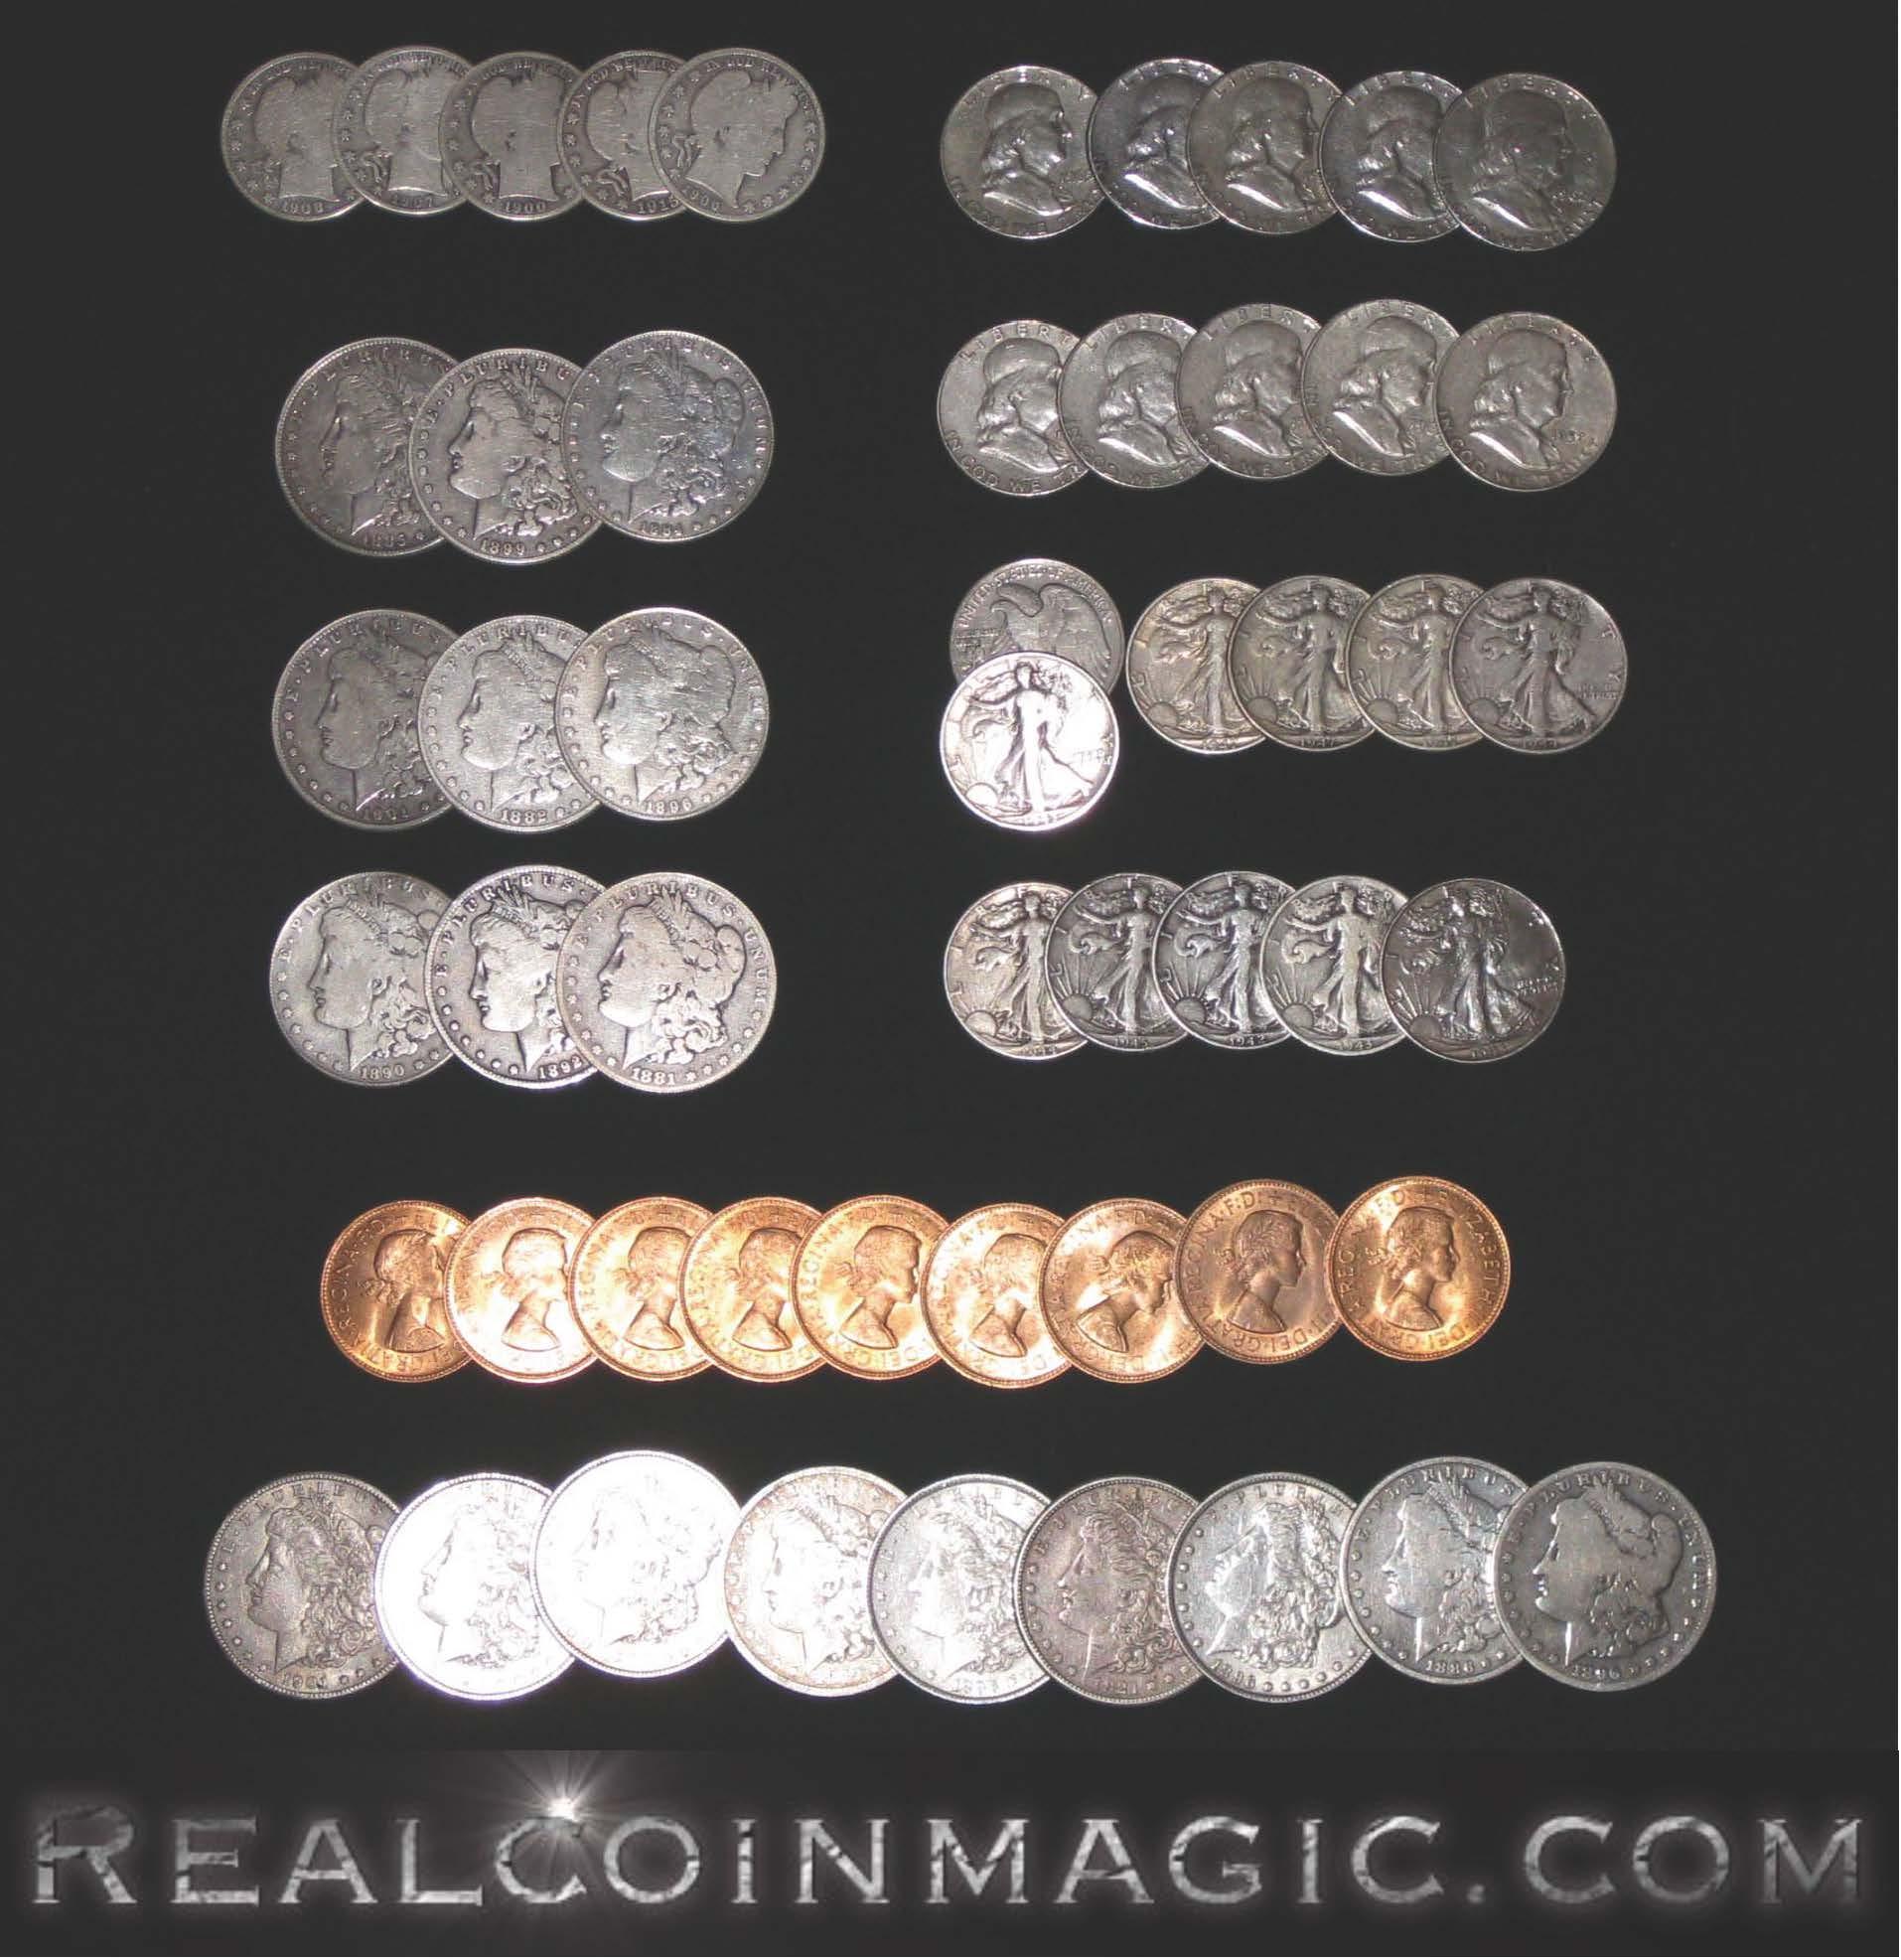 Realcoinmagic.com